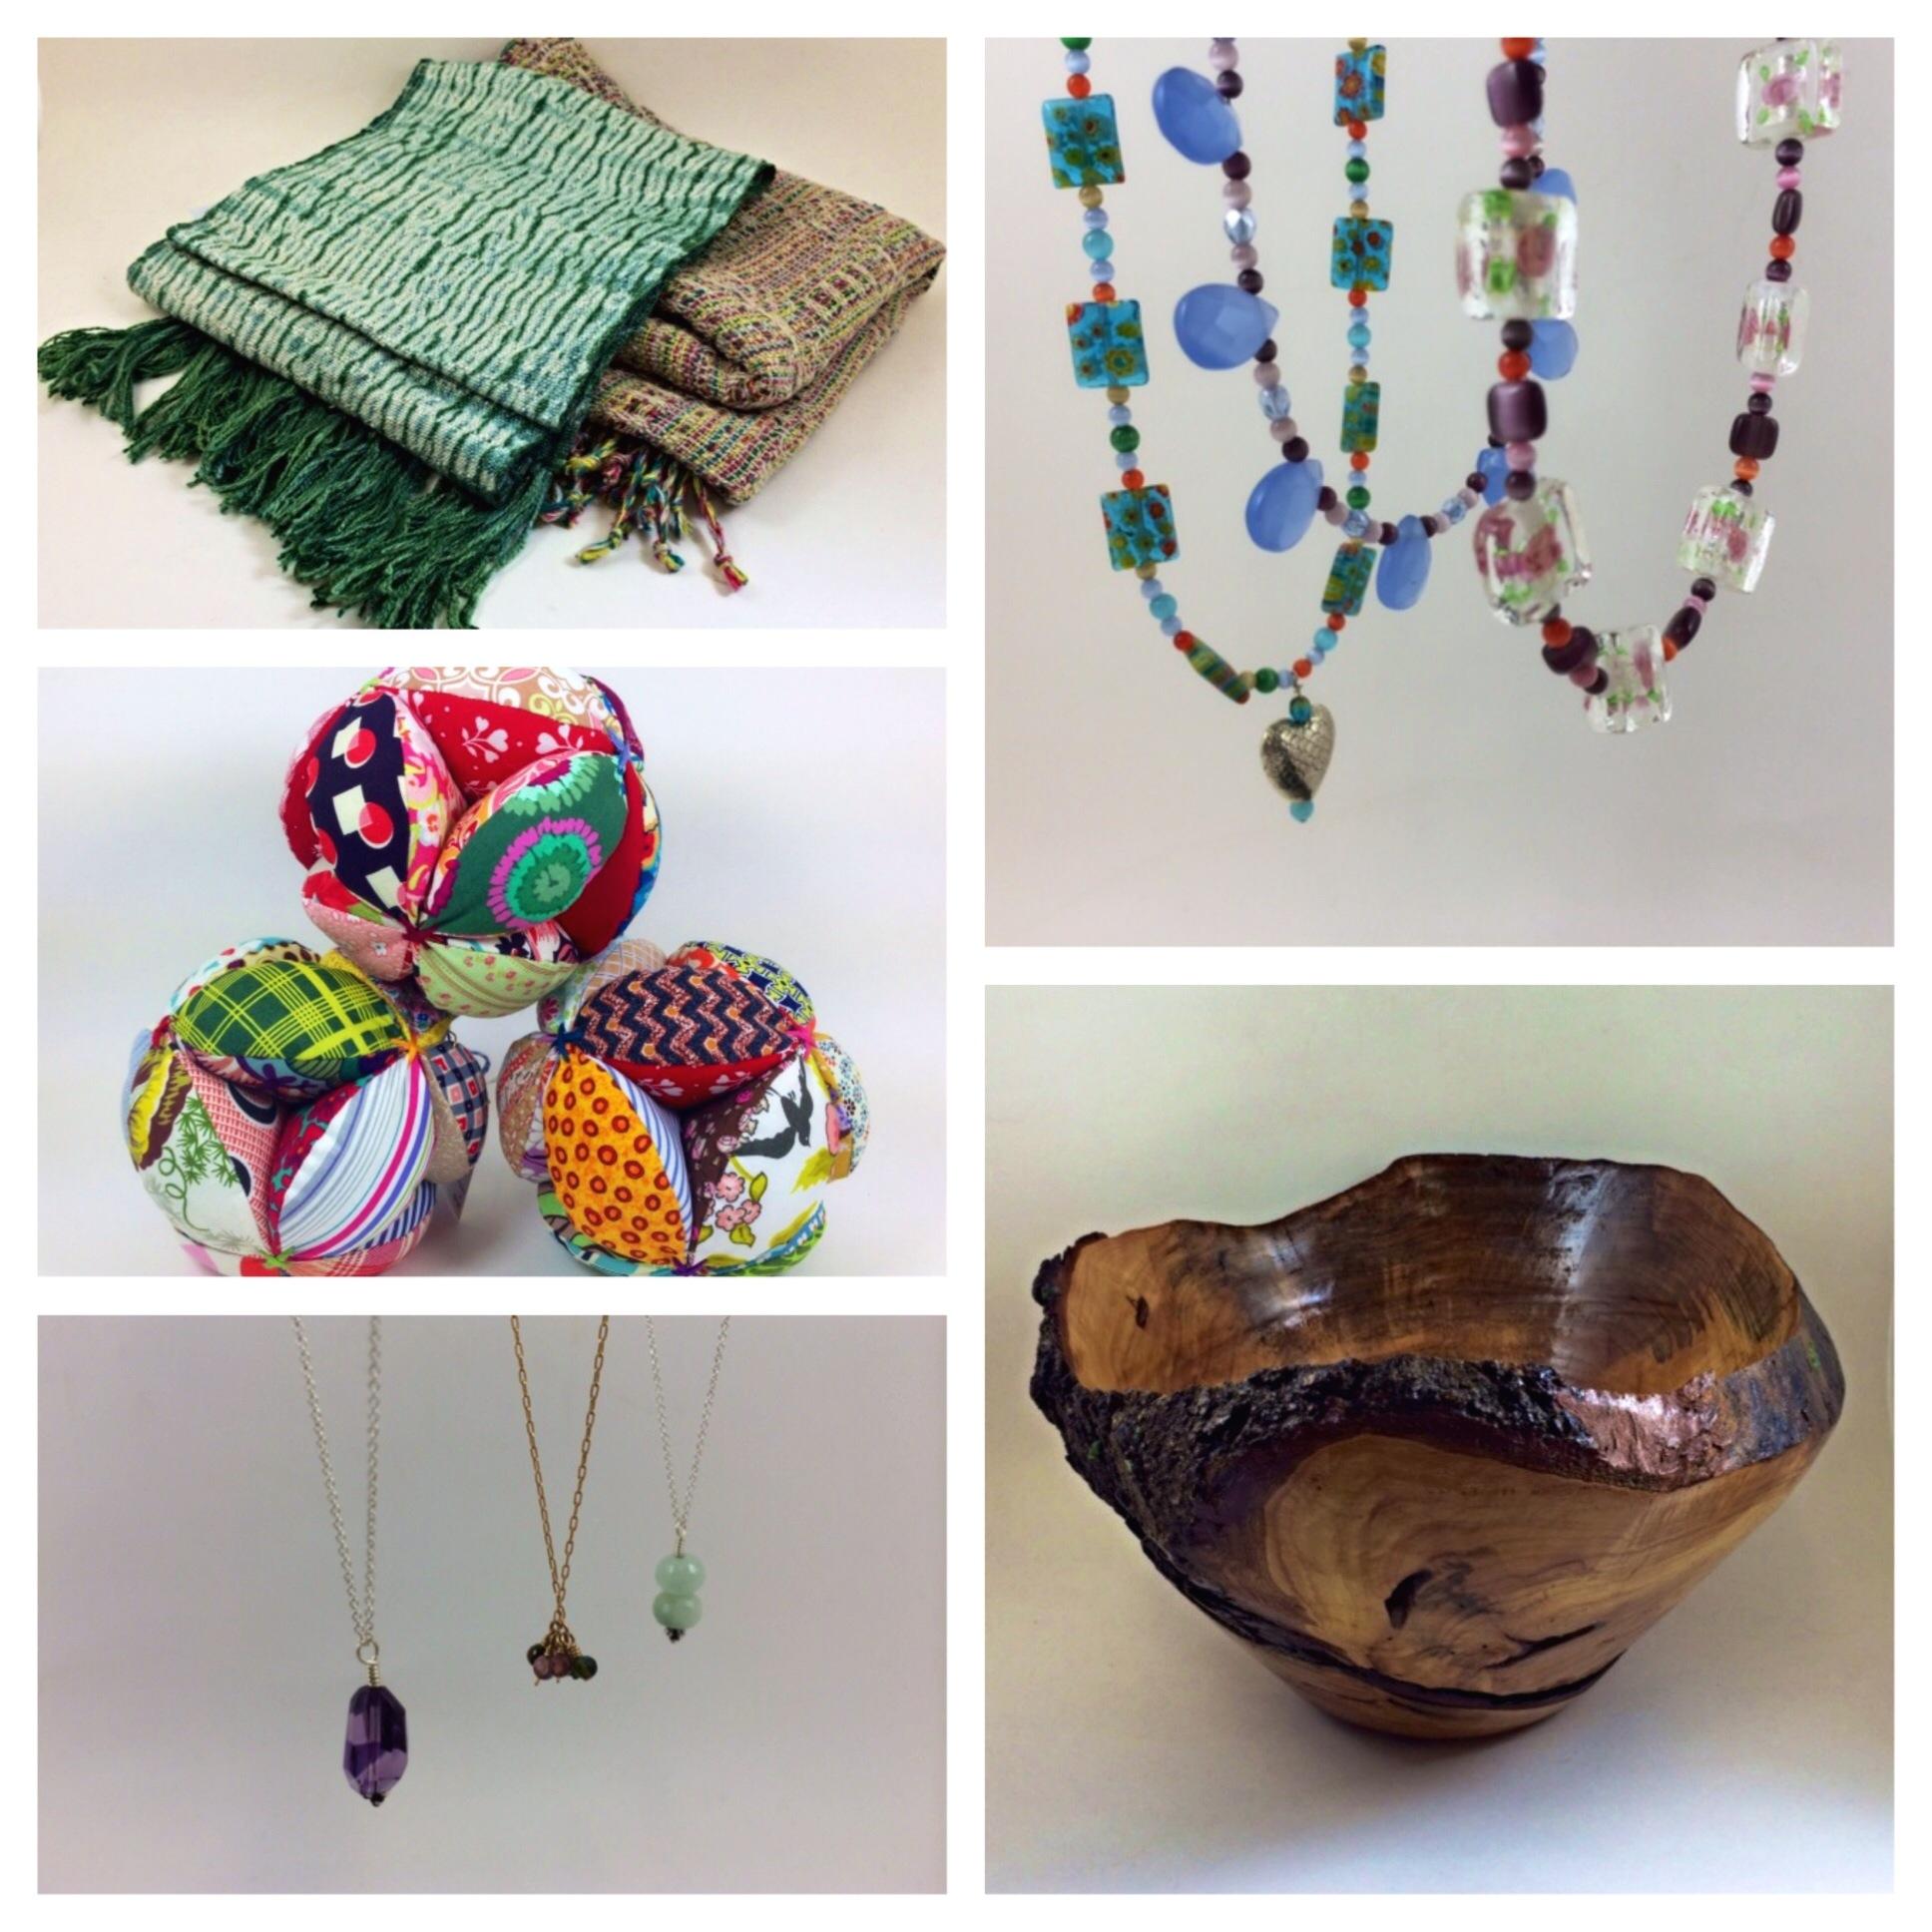 Craft Fair Goods In Brooklyn At Women's Exchange